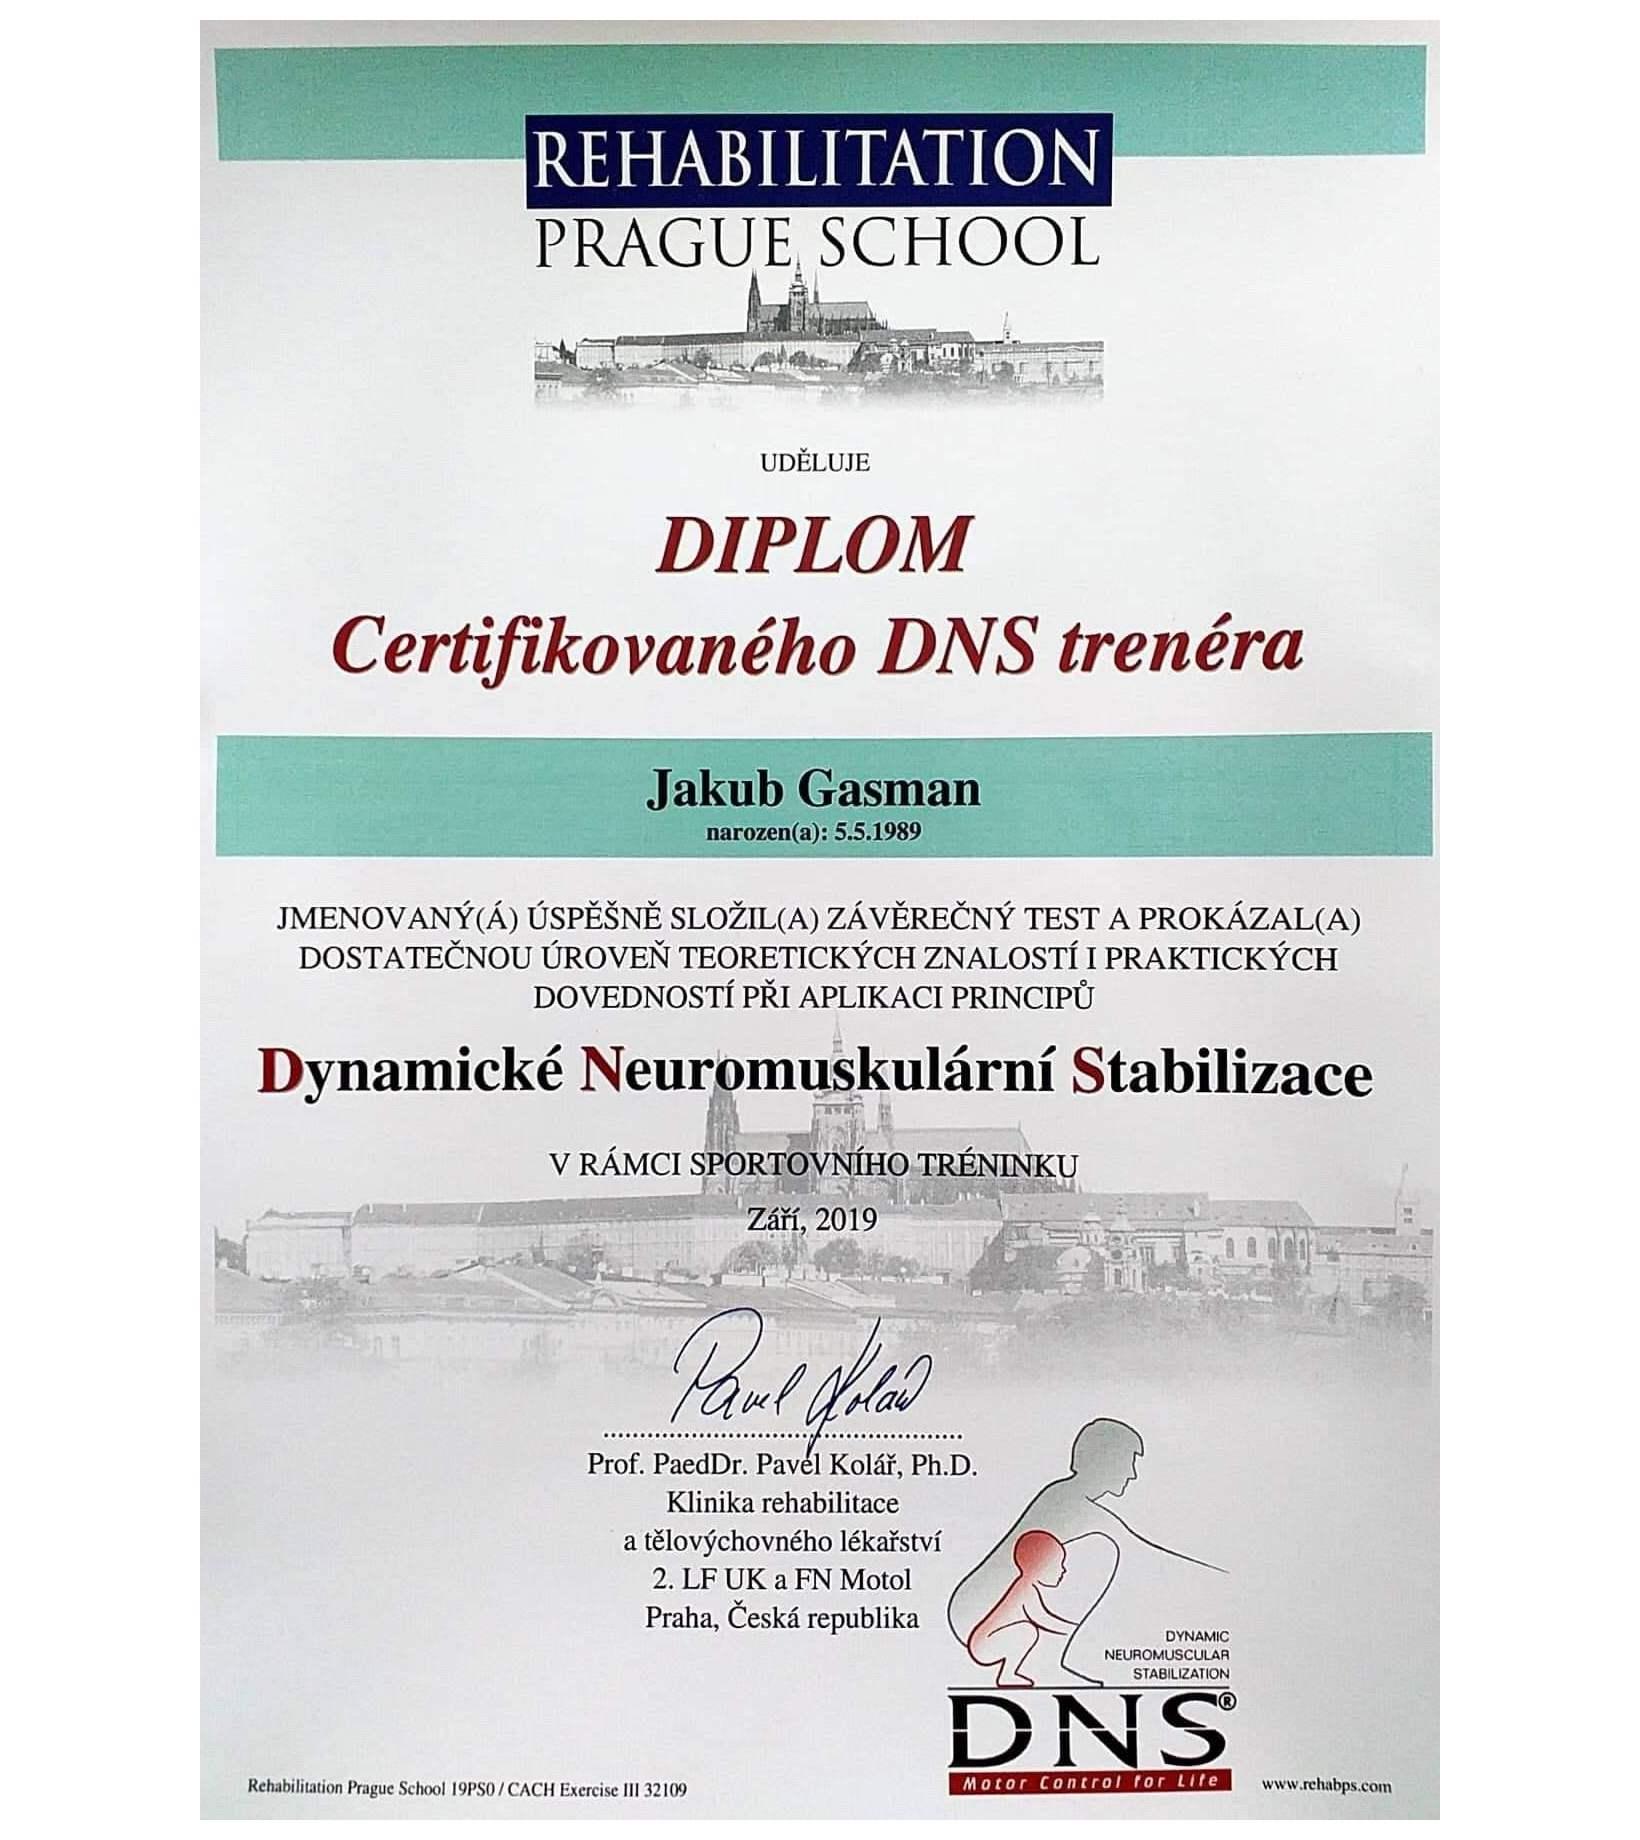 diplom-jakub-gasman-DNS-kolar-diagnostika-ram